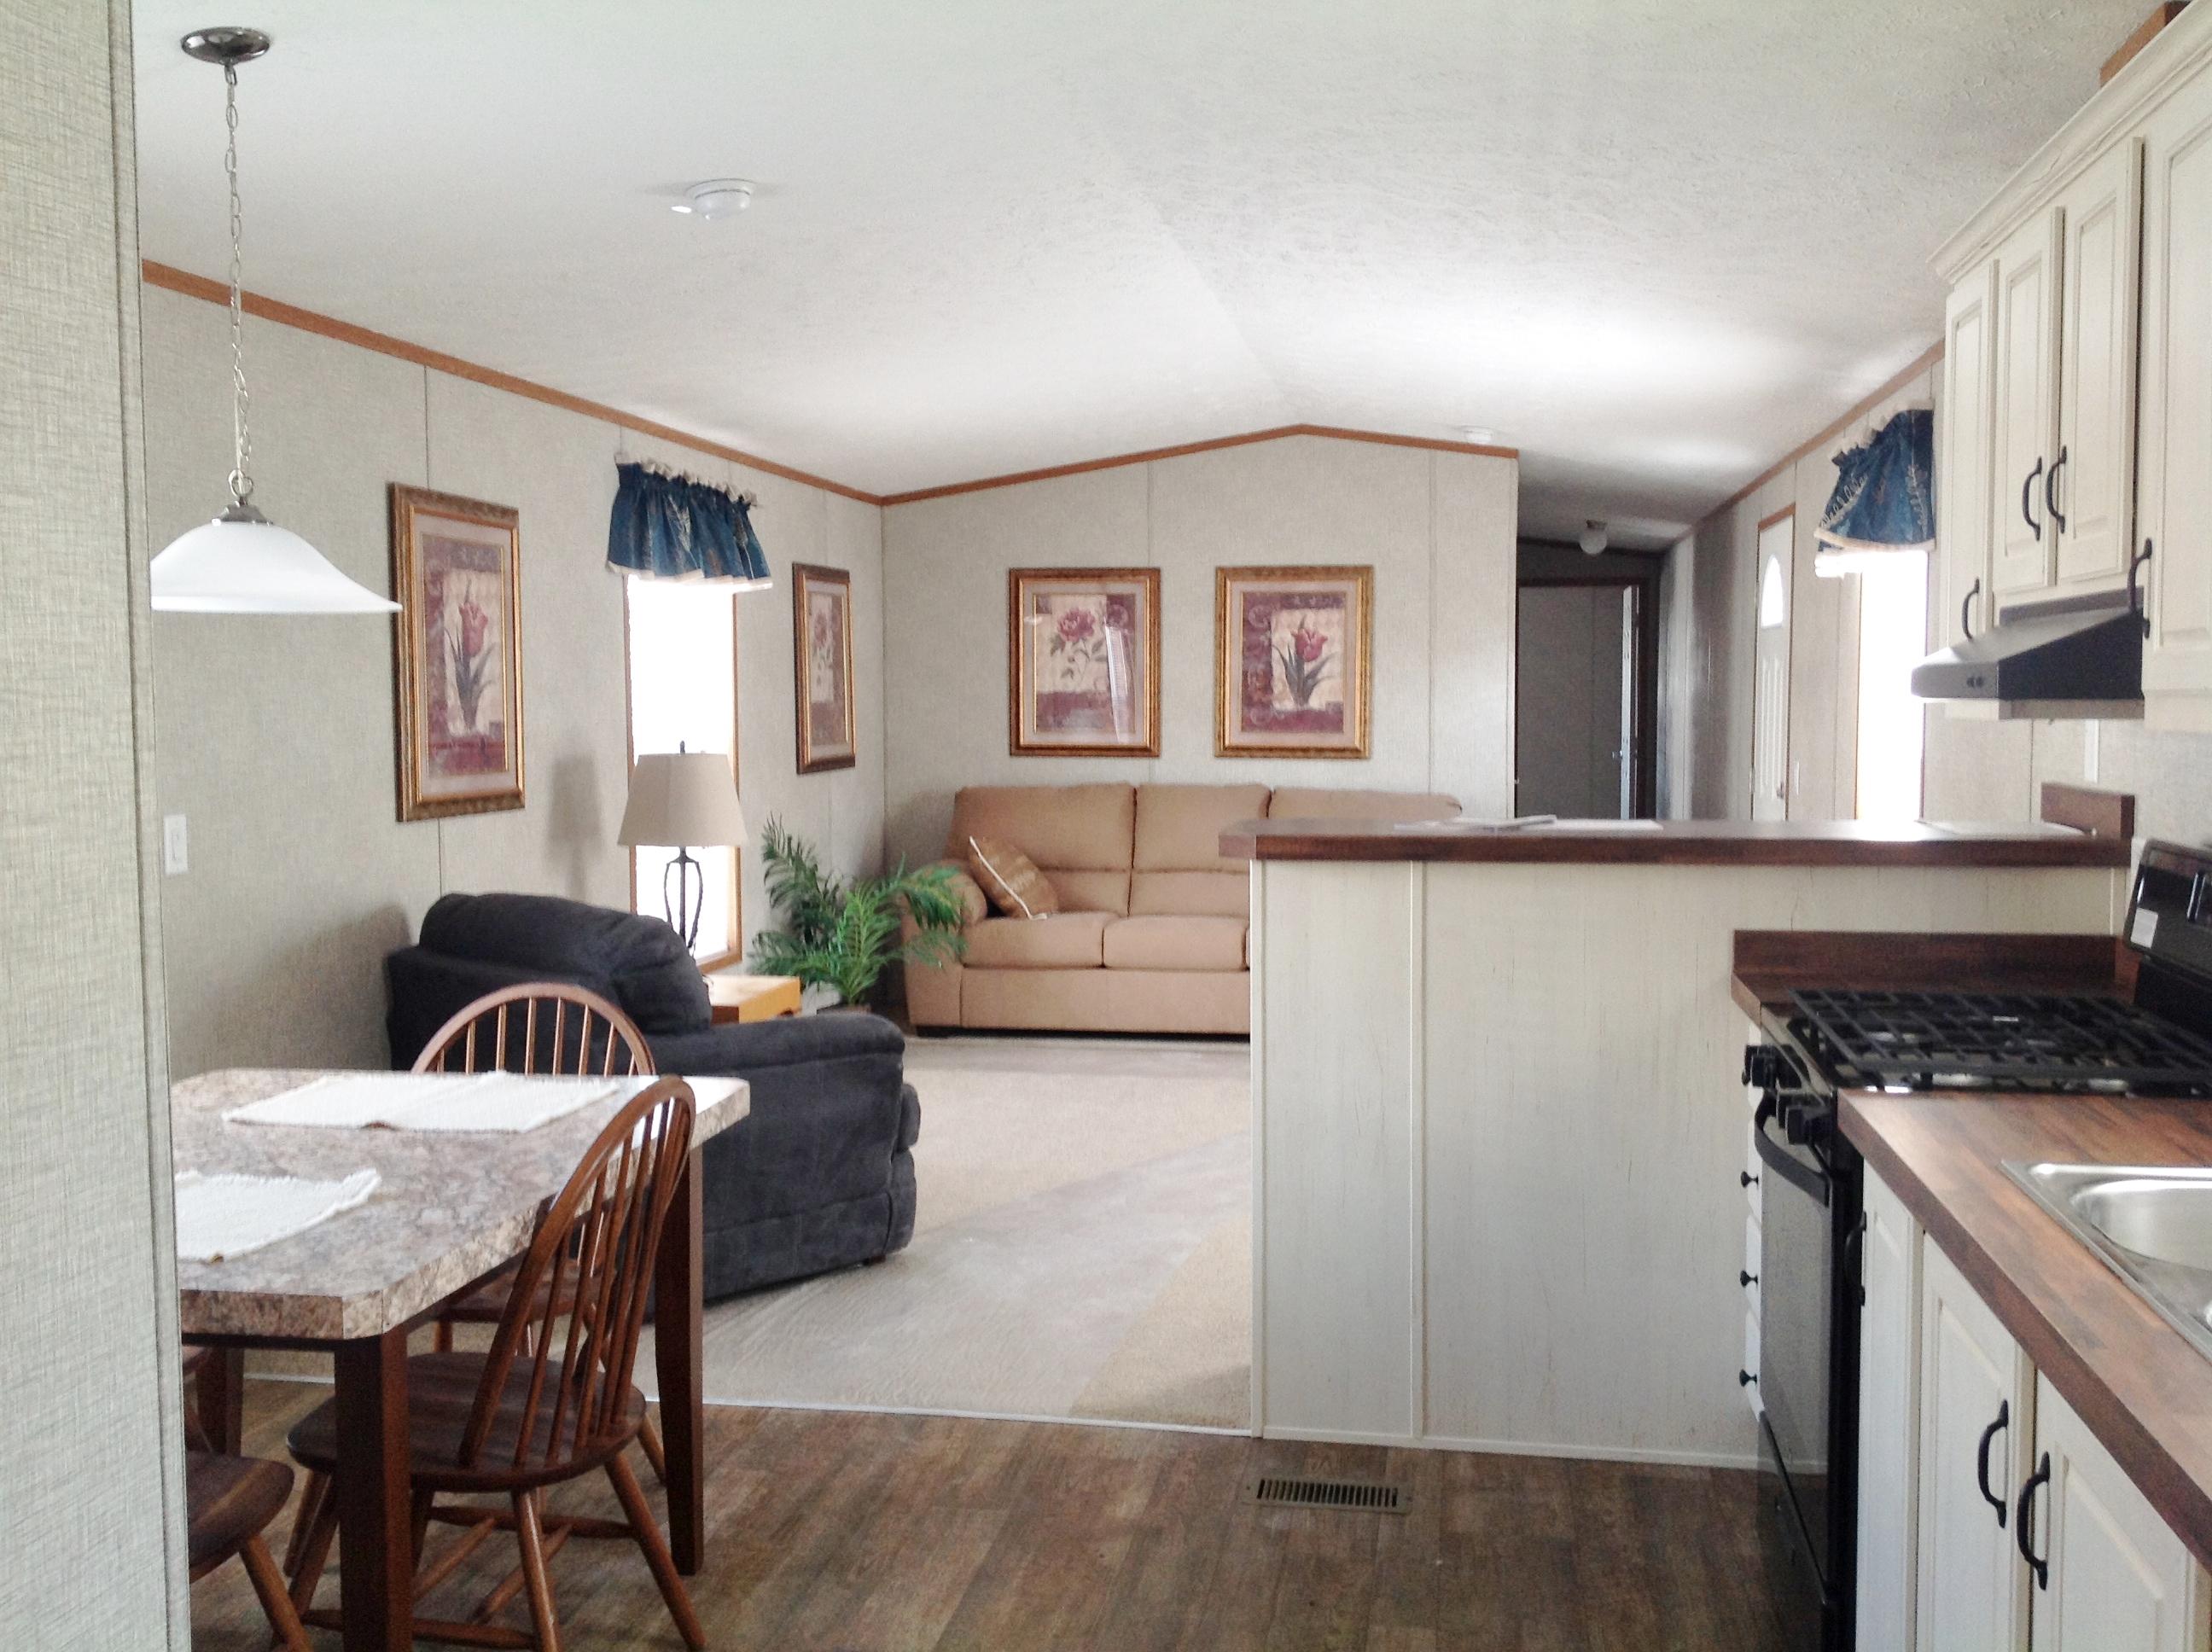 Wider View From Kitchen